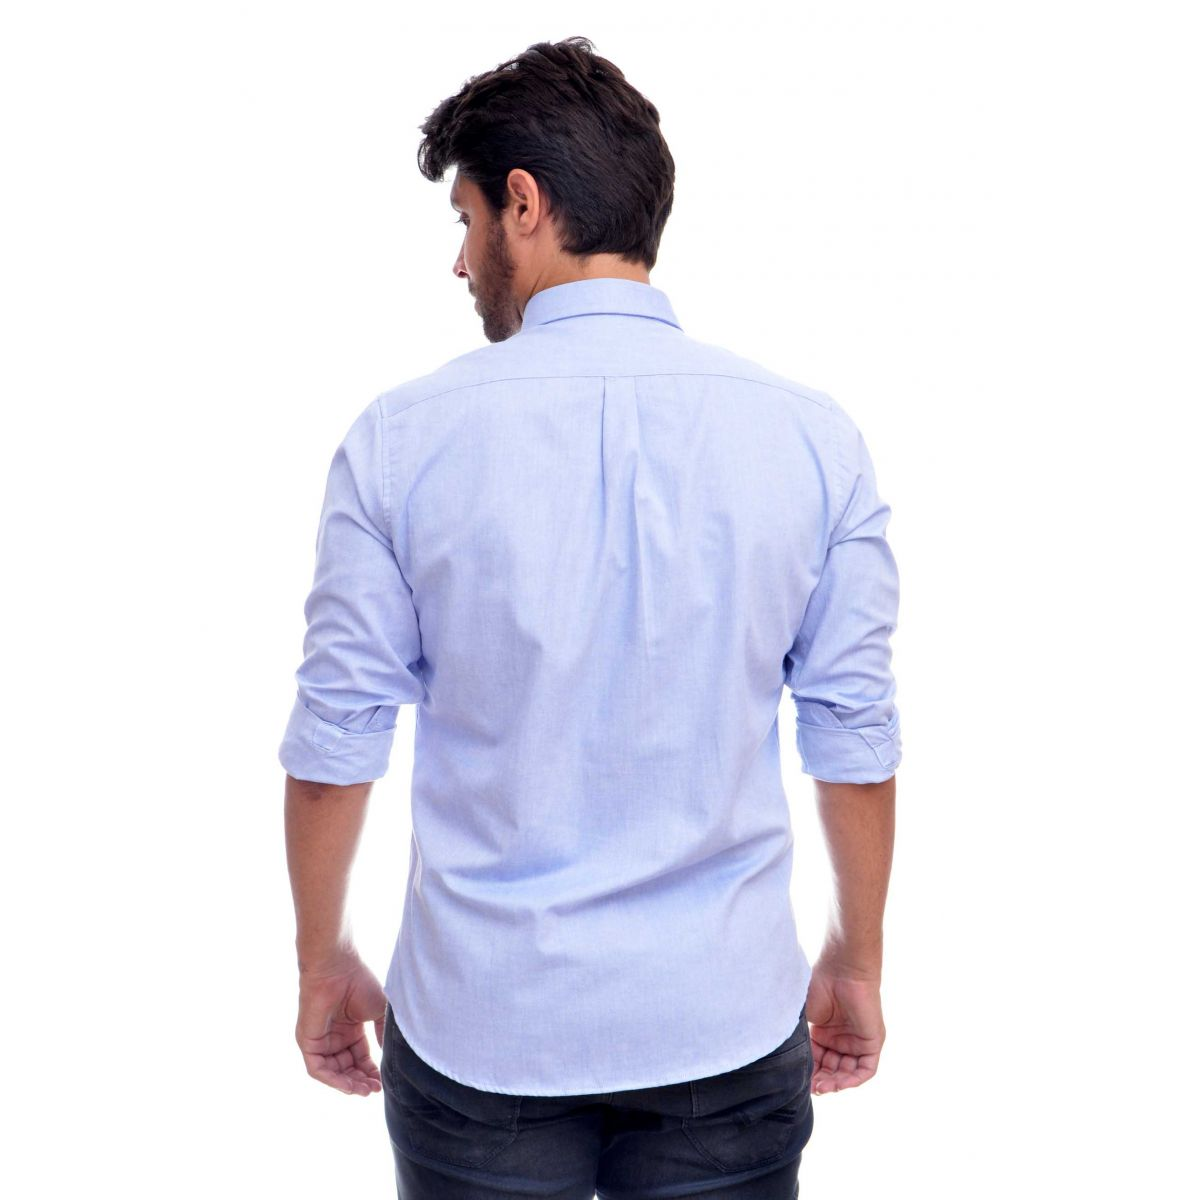 Camisa Social Oxford RL  Azul Claro  - Regular Fit  - Ca Brasileira